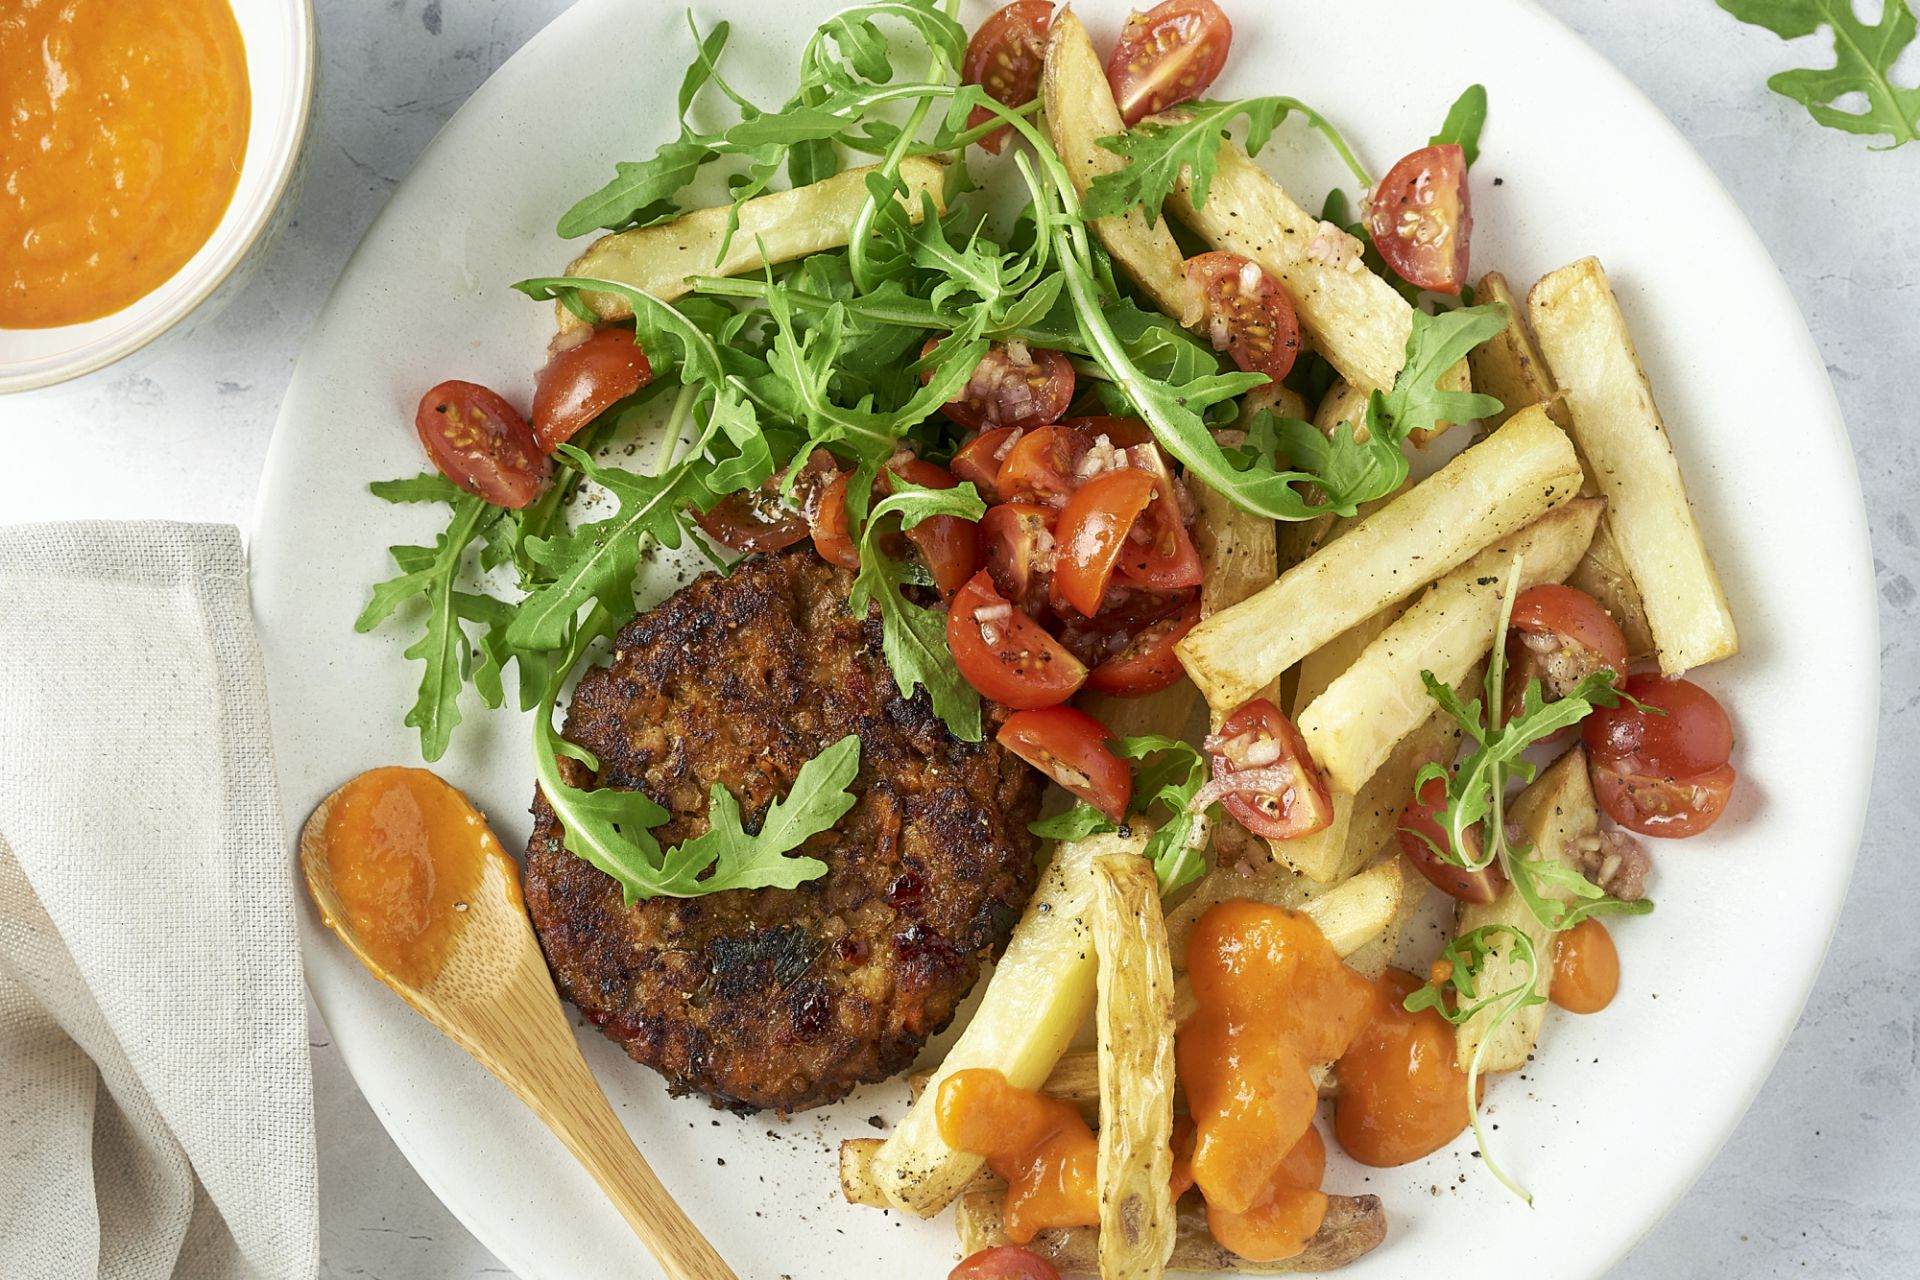 Groenteburger met rodepaprikasaus en ovenfrietjes